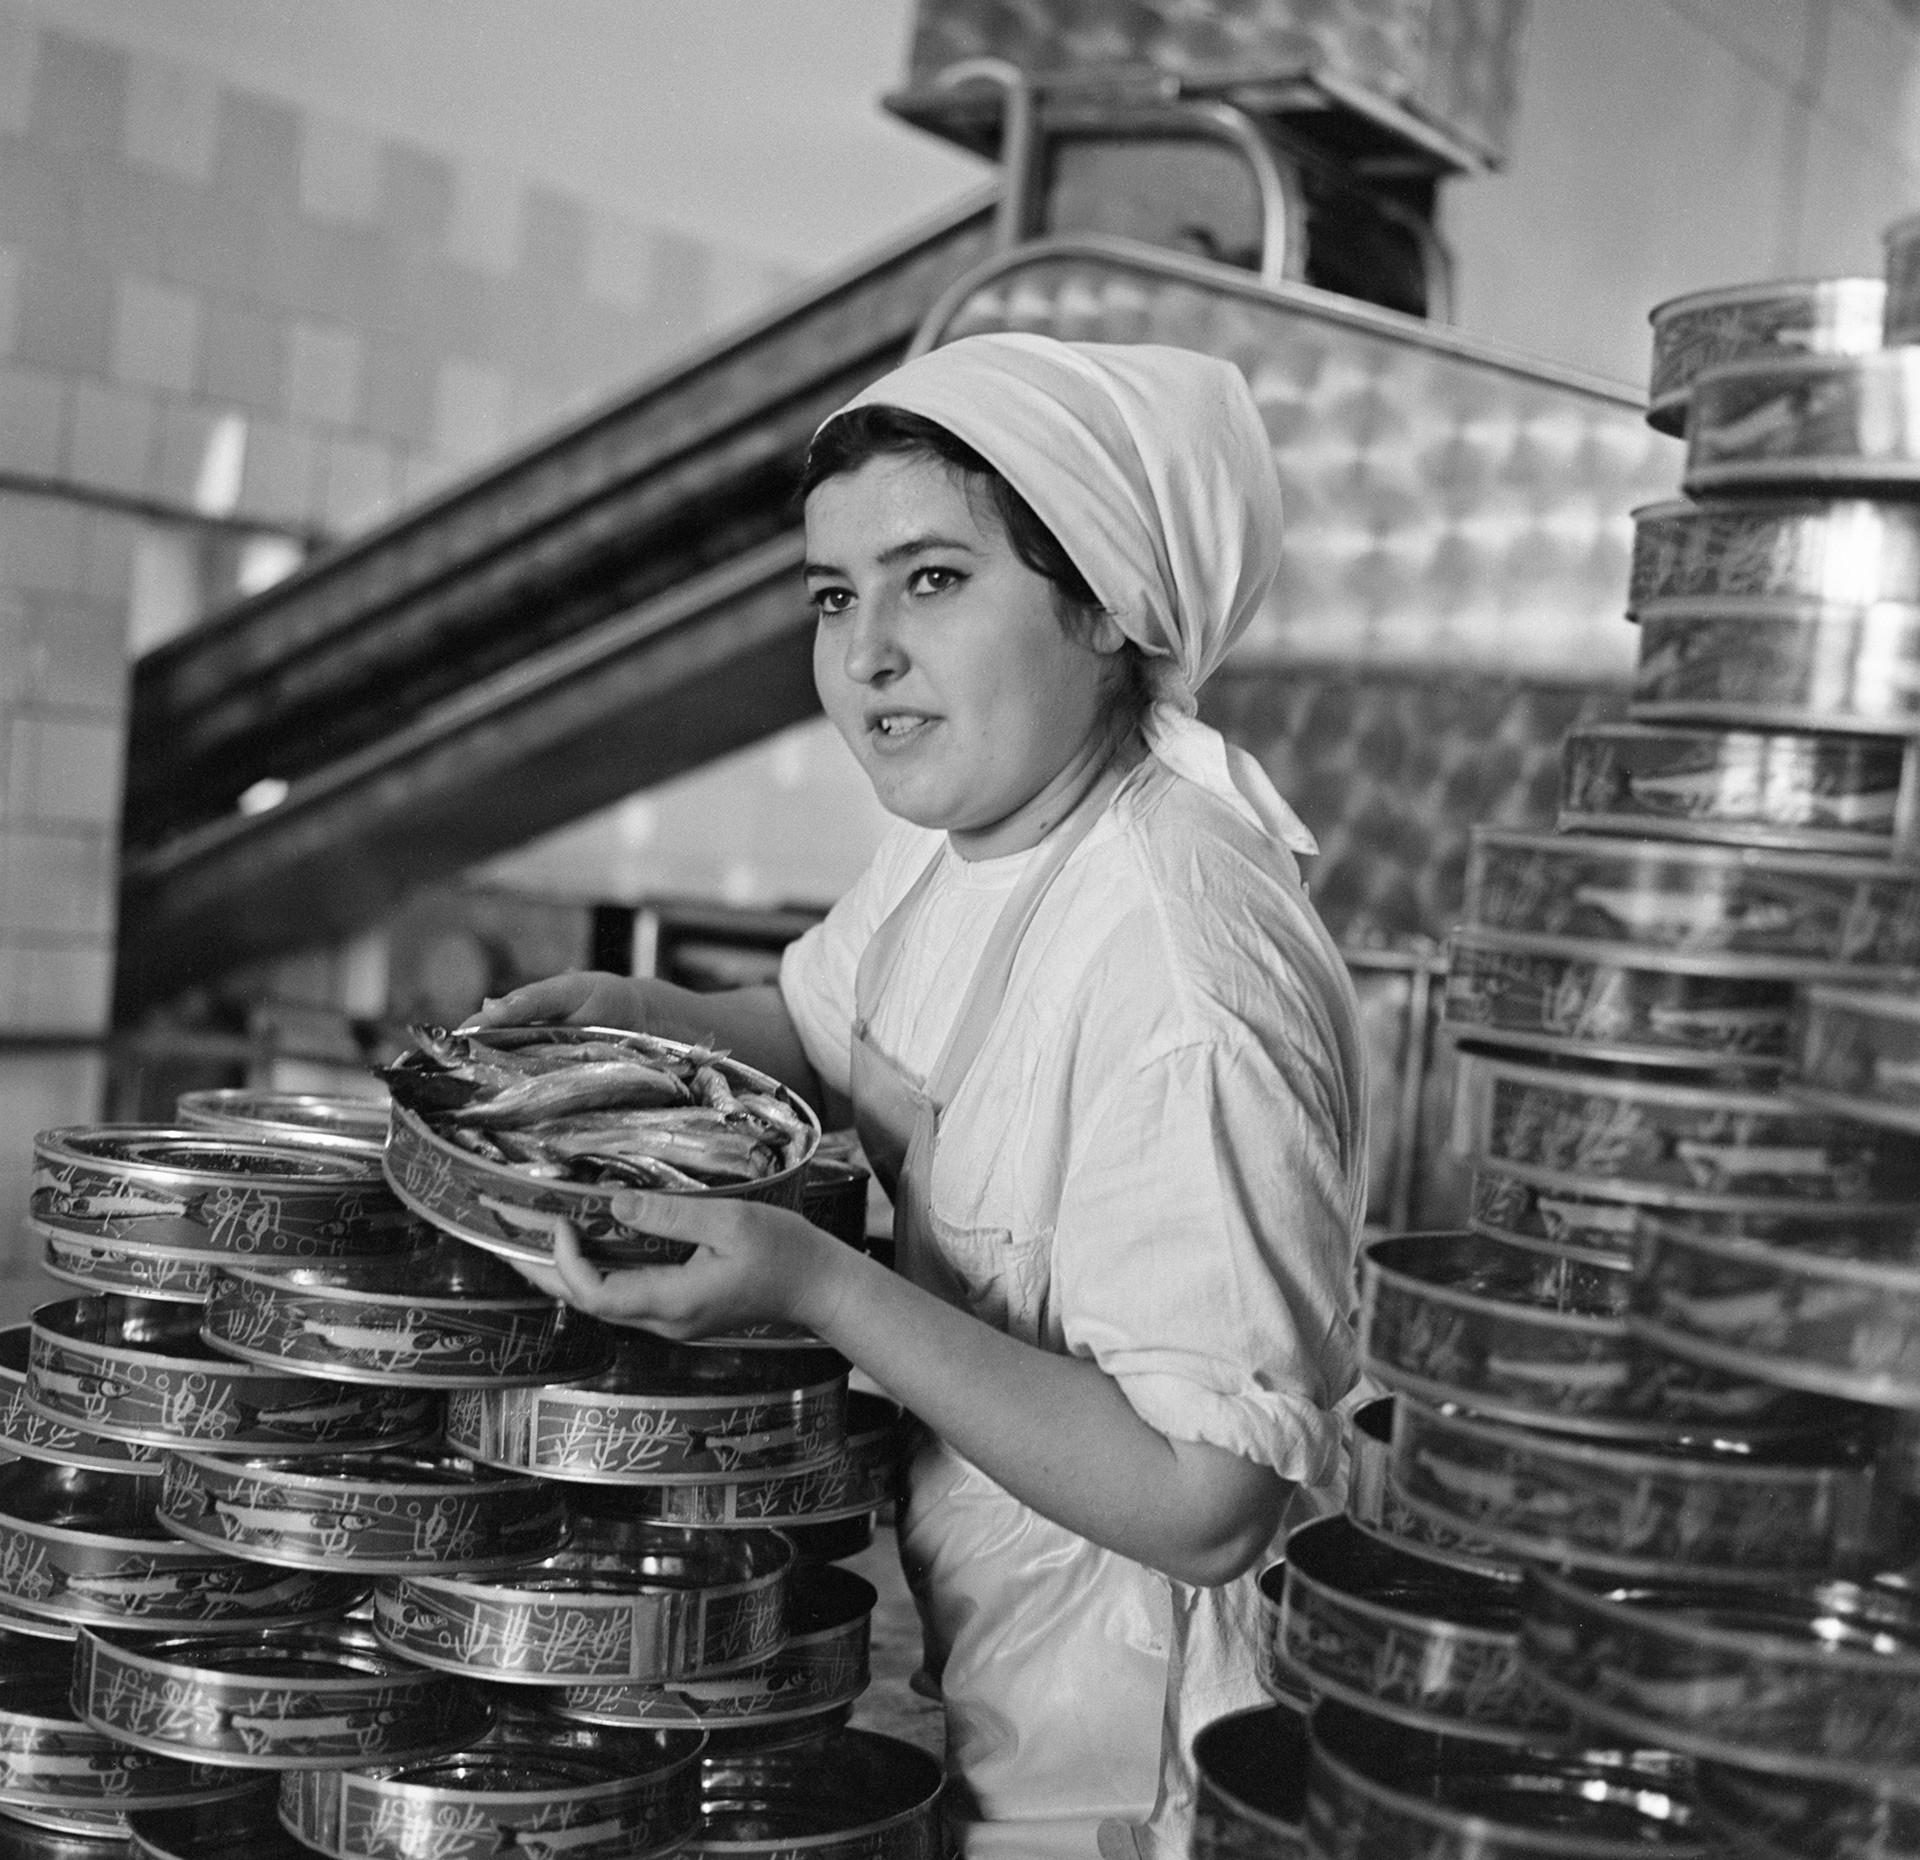 The Murmansk fish processing plant, 1971.